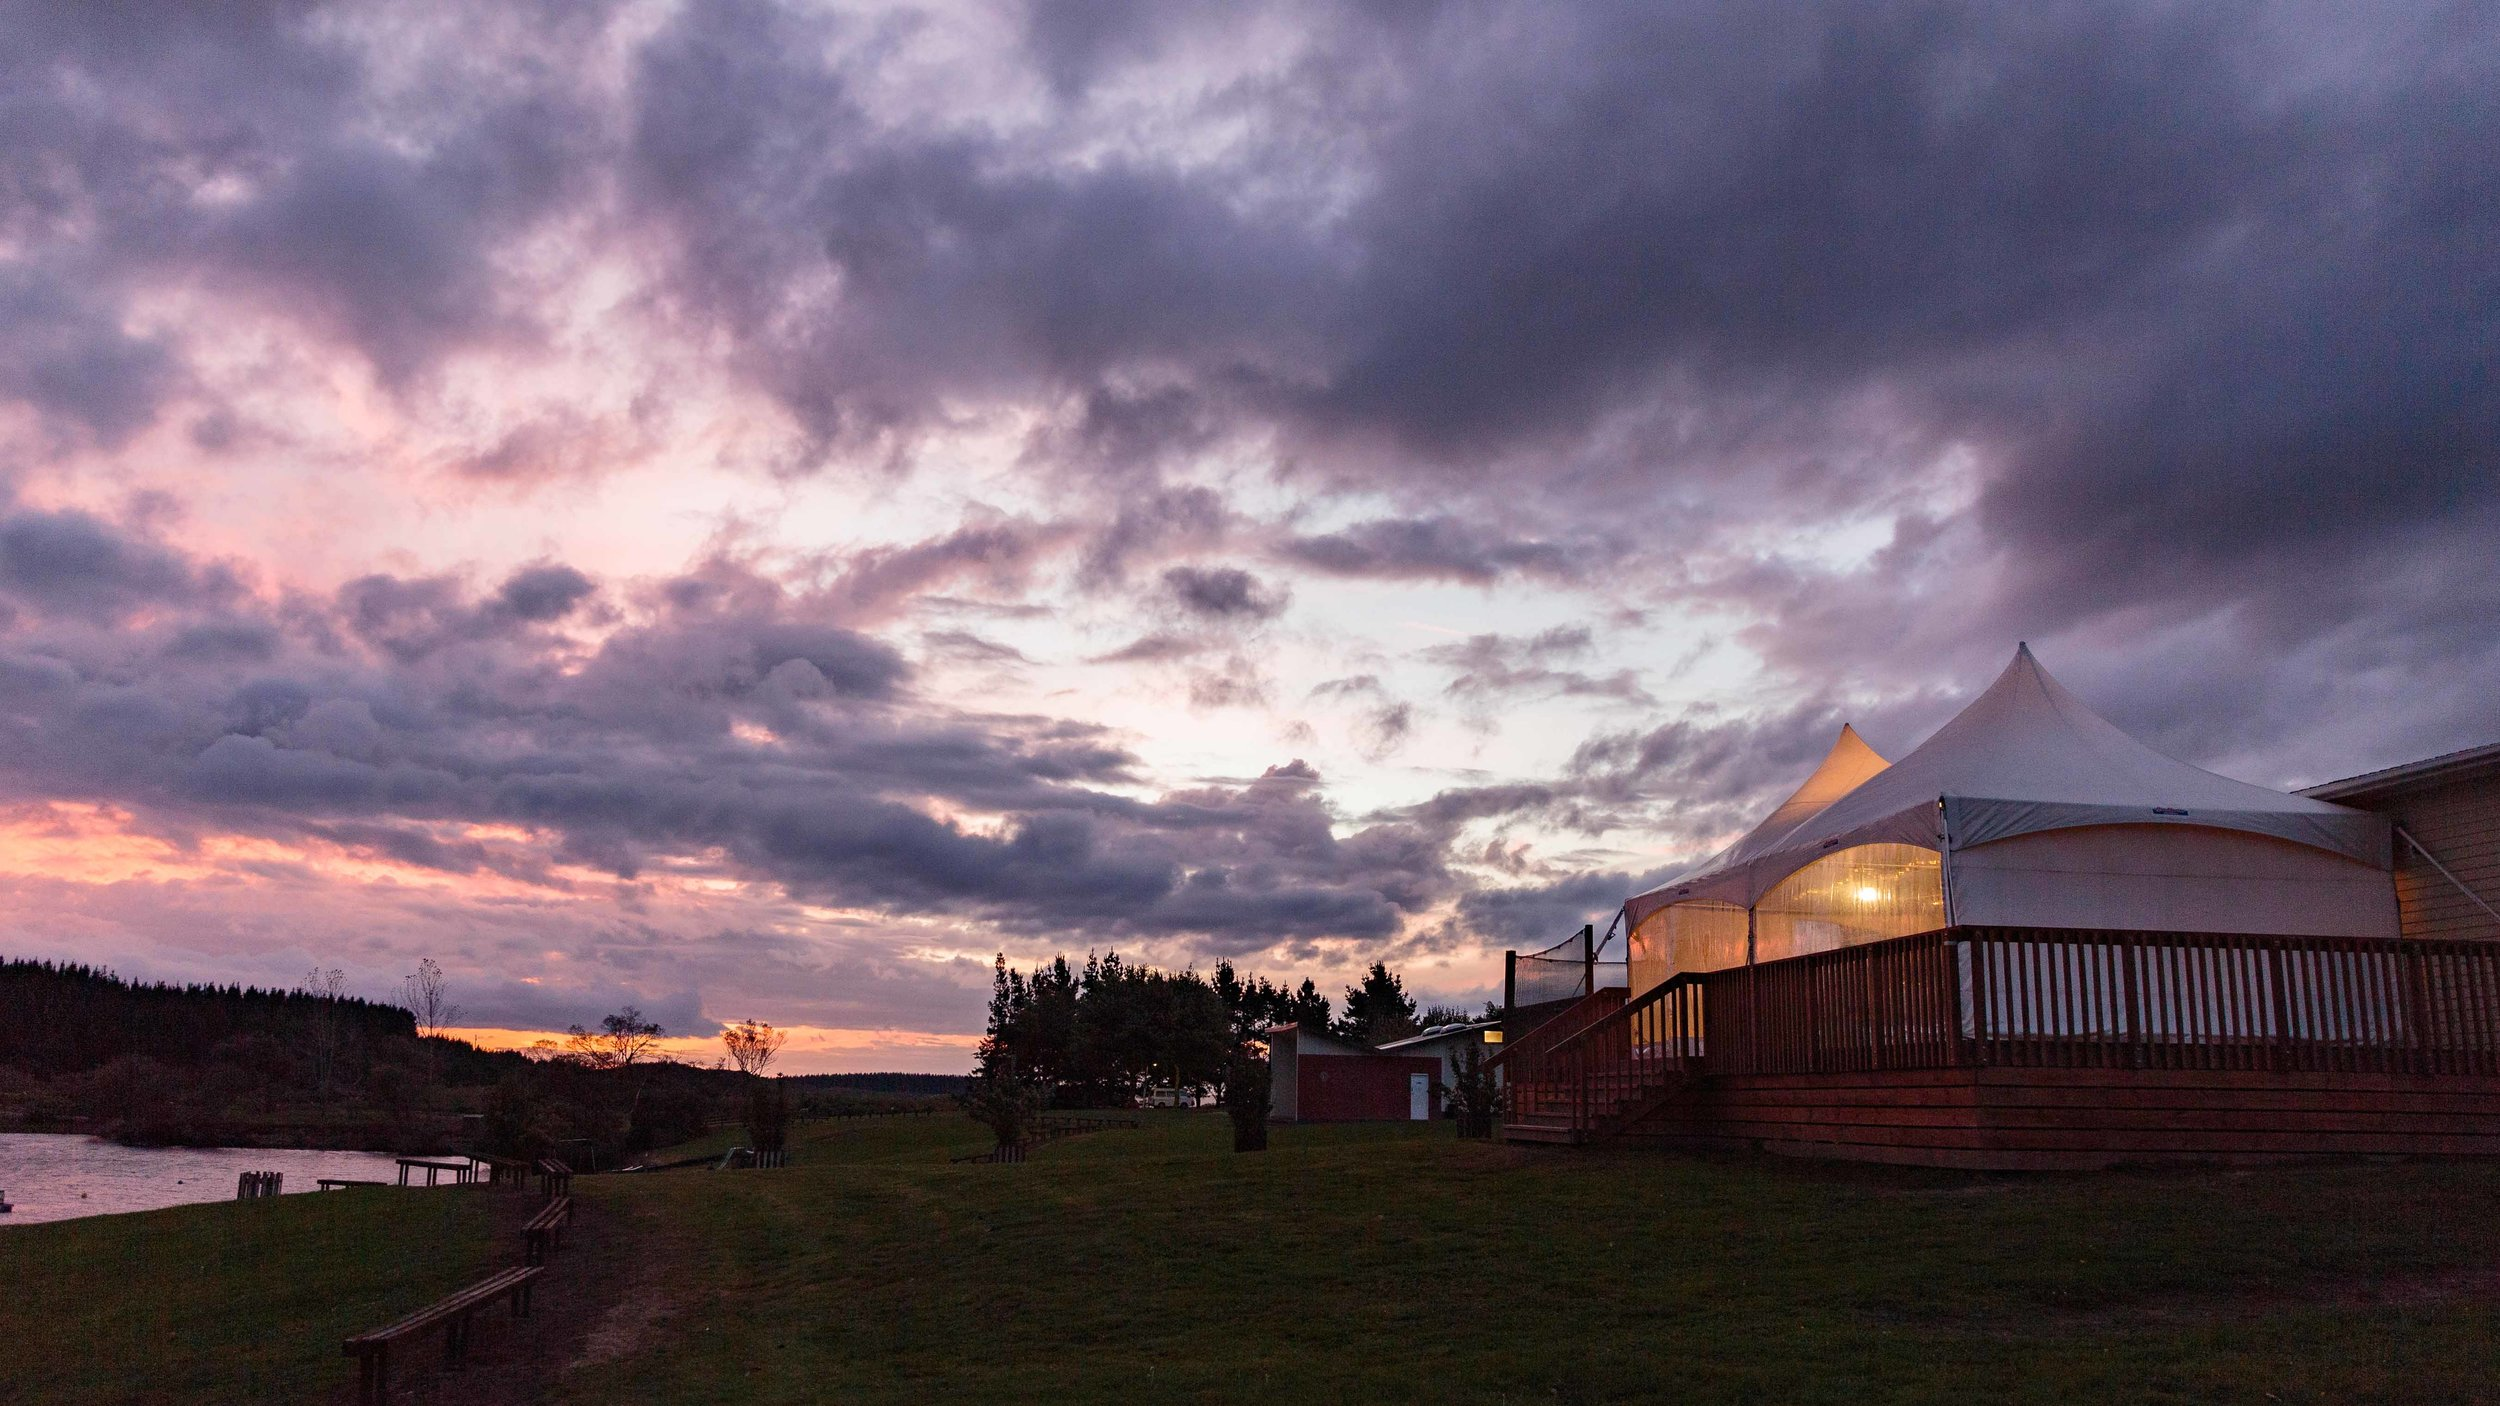 Highight-wedding-photography-dudding-lake-palmerston-north-new-zealand-76.jpg